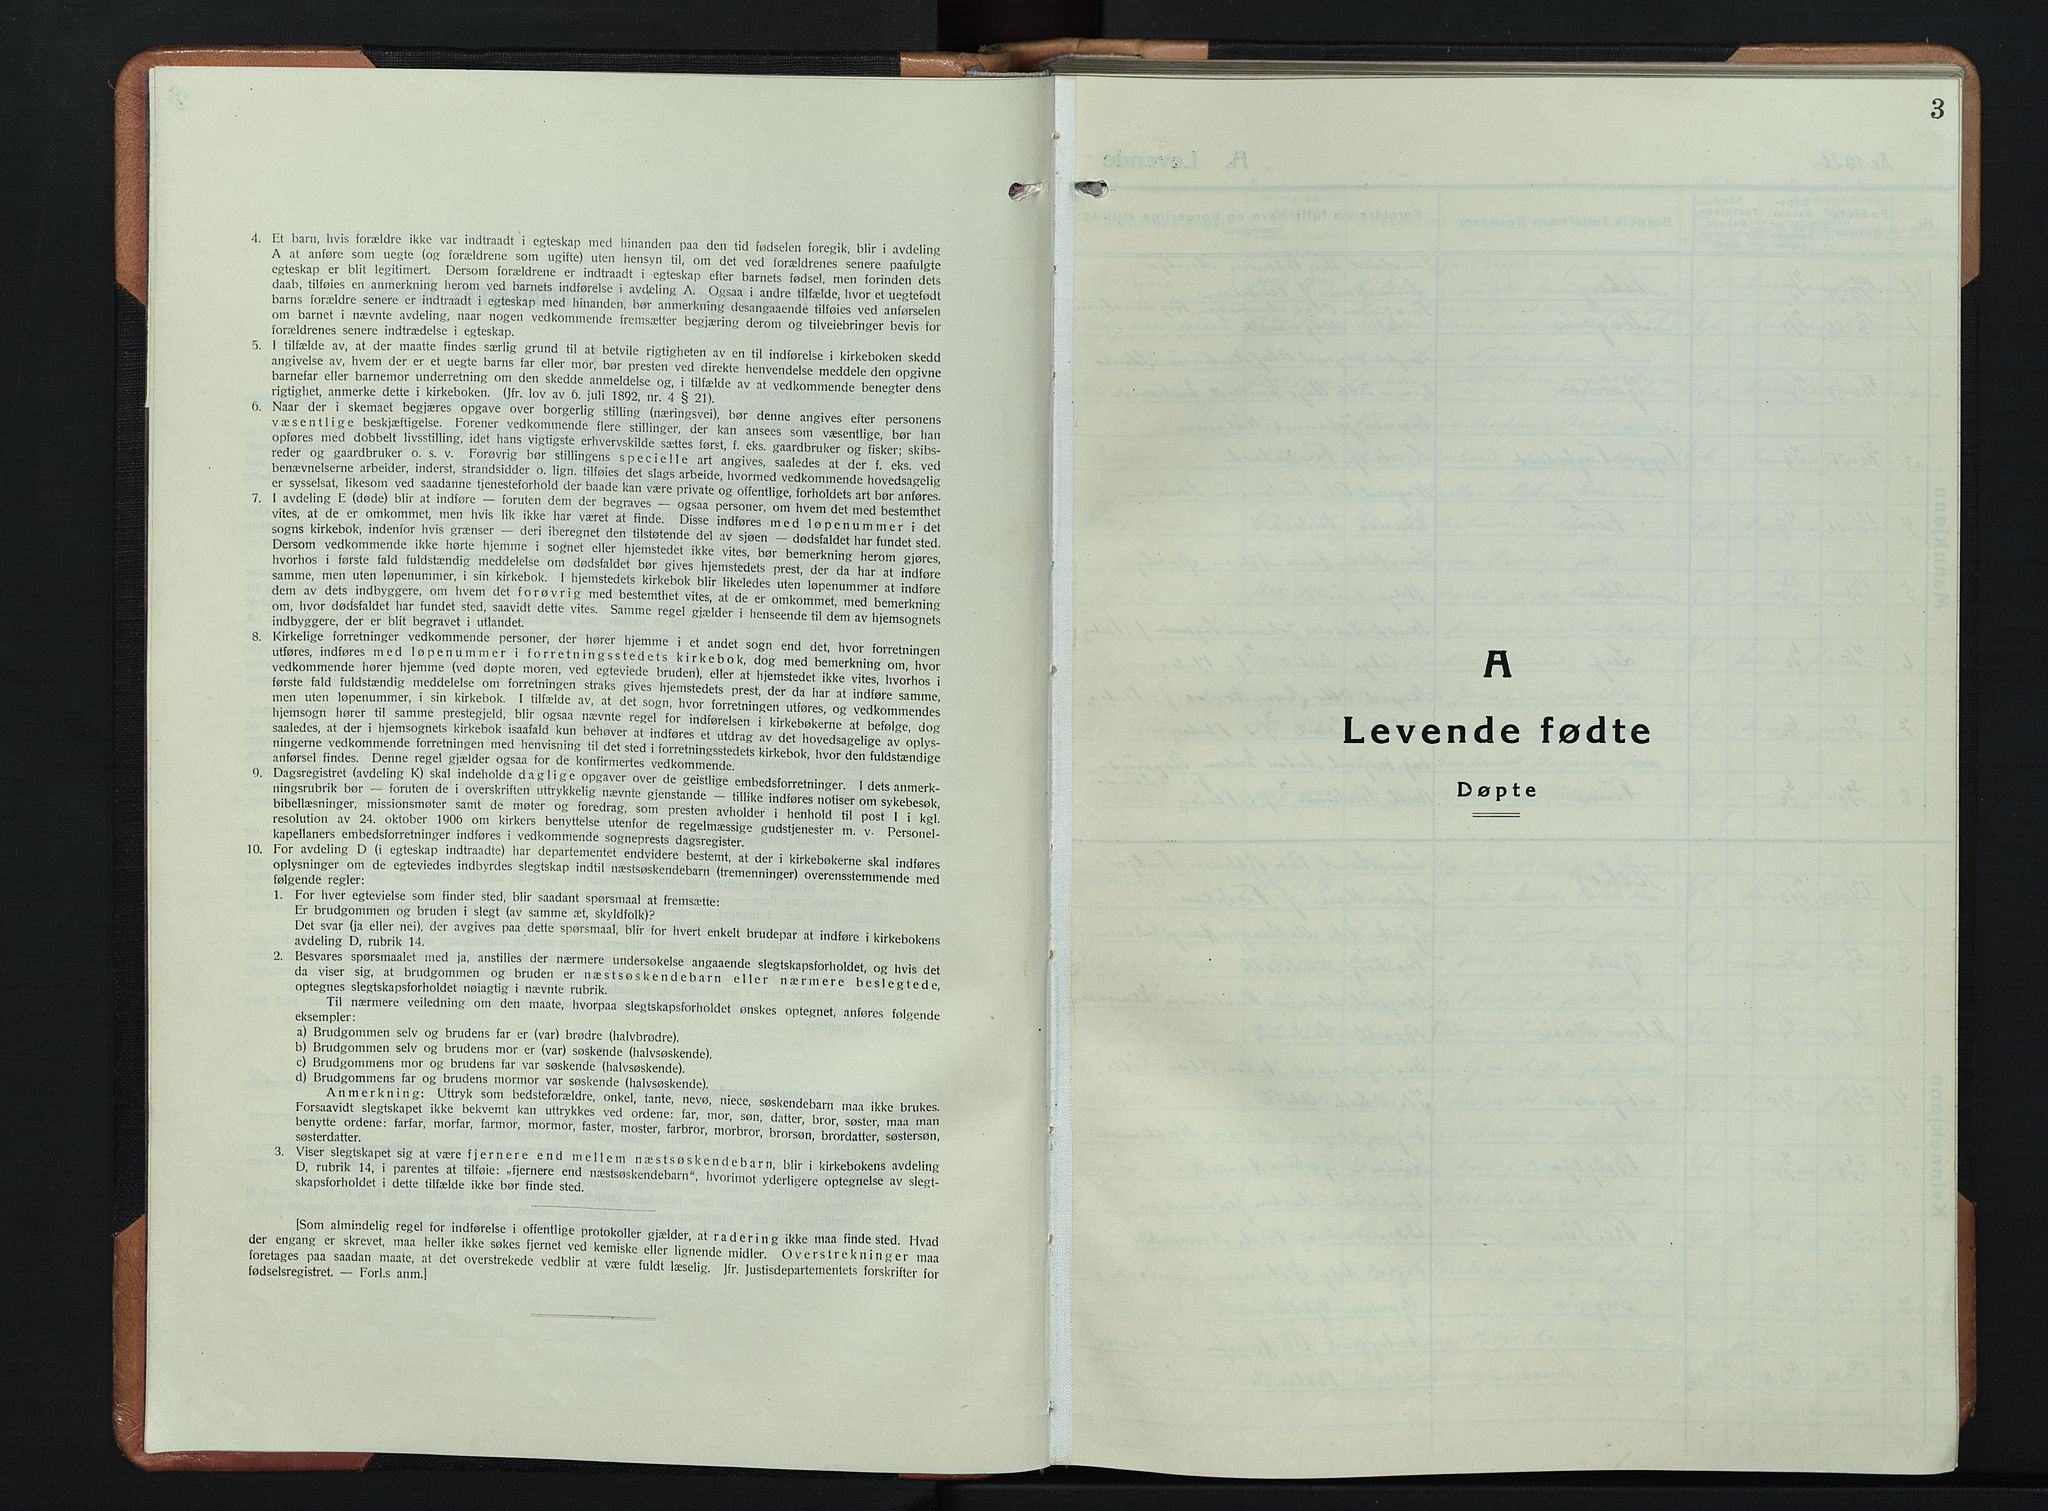 SAH, Søndre Land prestekontor, L/L0008: Klokkerbok nr. 8, 1926-1950, s. 3